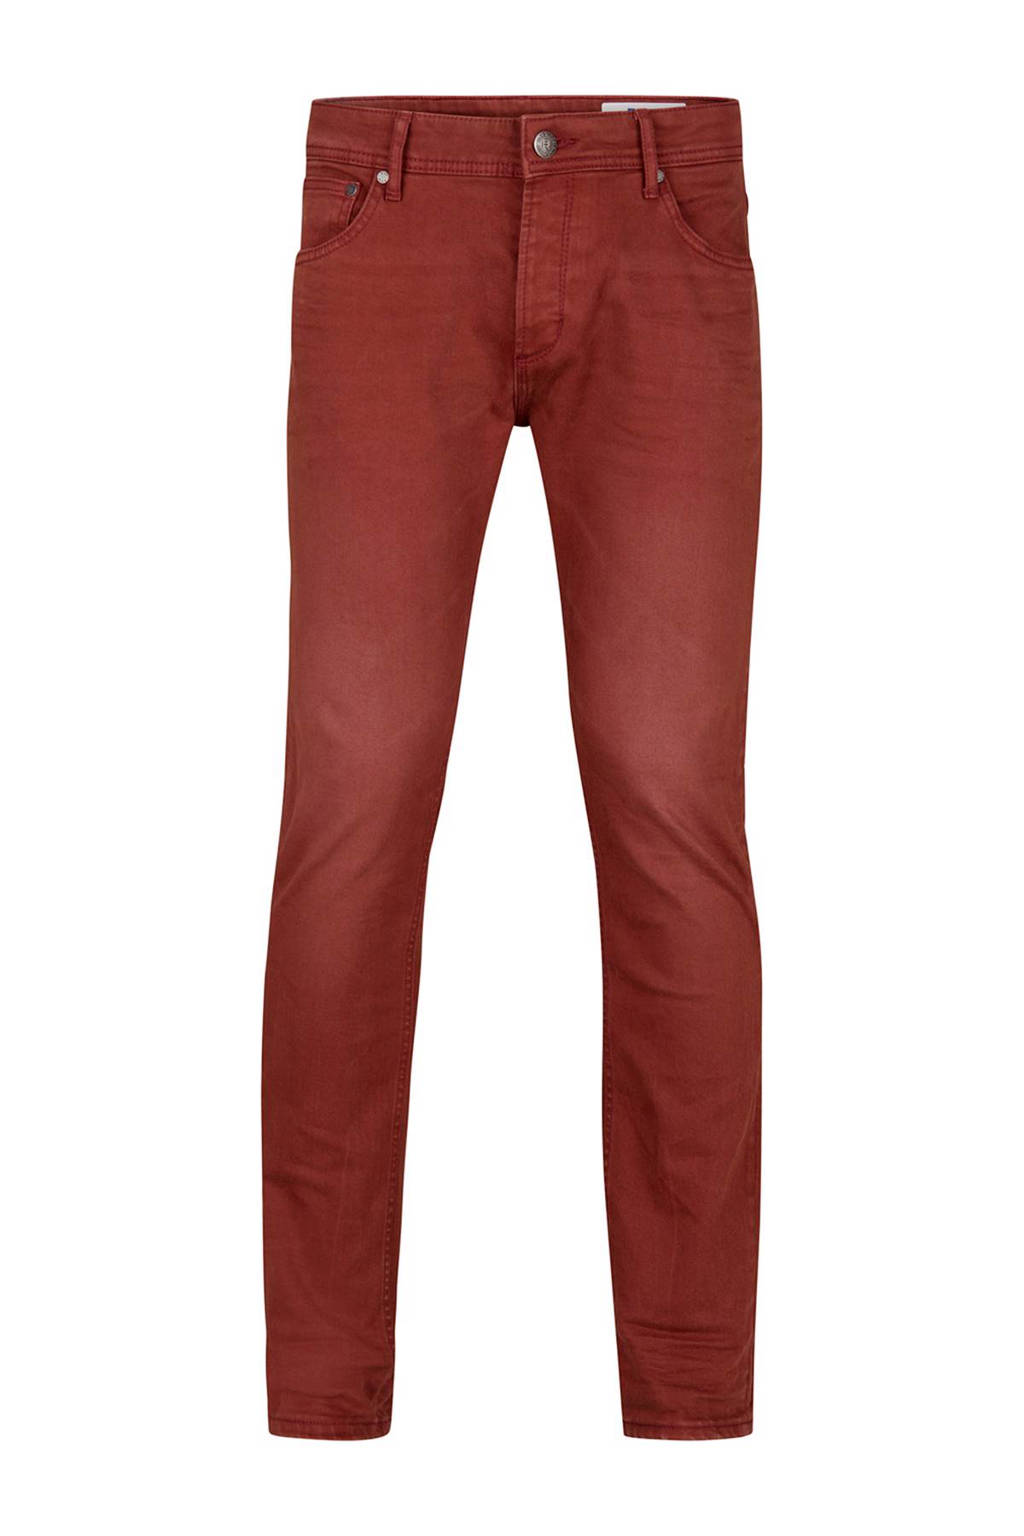 WE Fashion Blue Ridge slim fit broek, Donkerrood